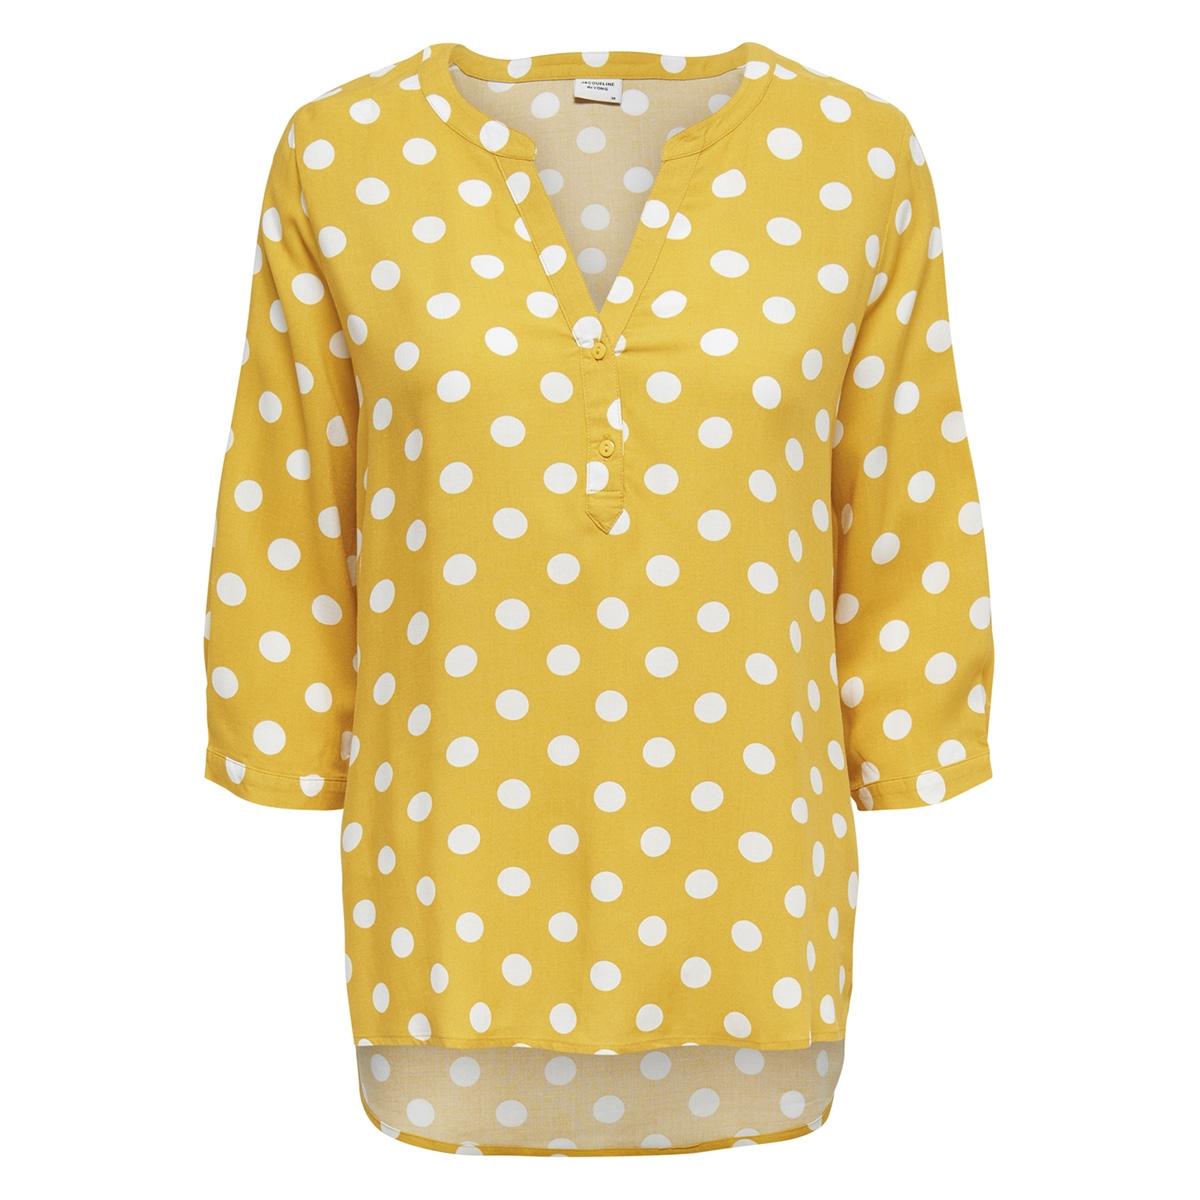 jdystar 3/4 placket top wvn1 fs 15171537 jacqueline de yong blouse spicy mustard/ cloud dancer